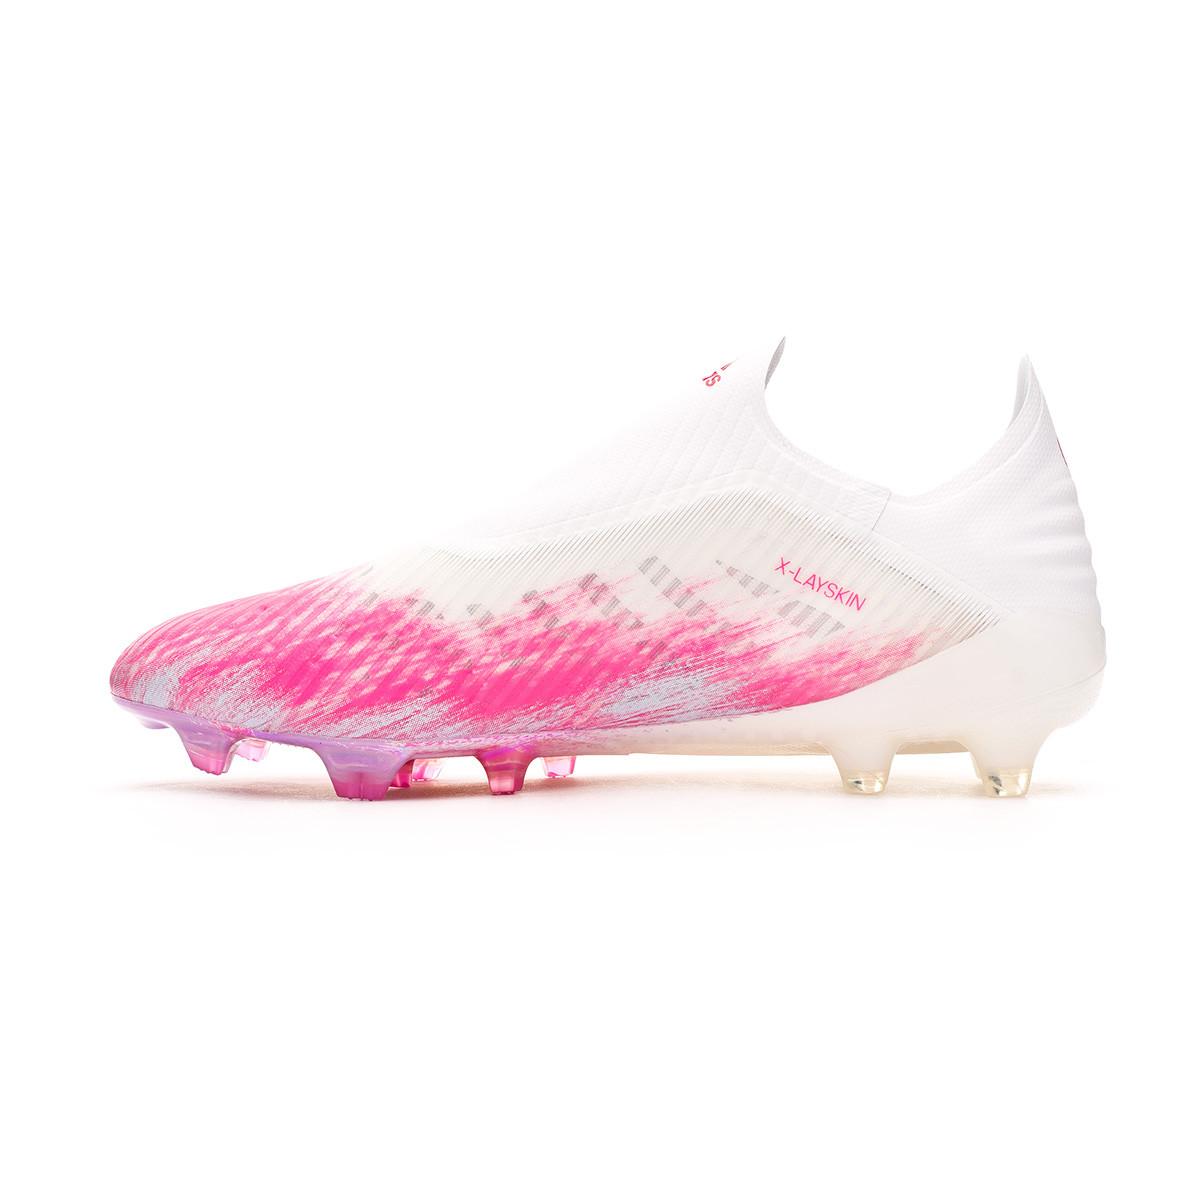 Football Boots adidas X 19+ FG White